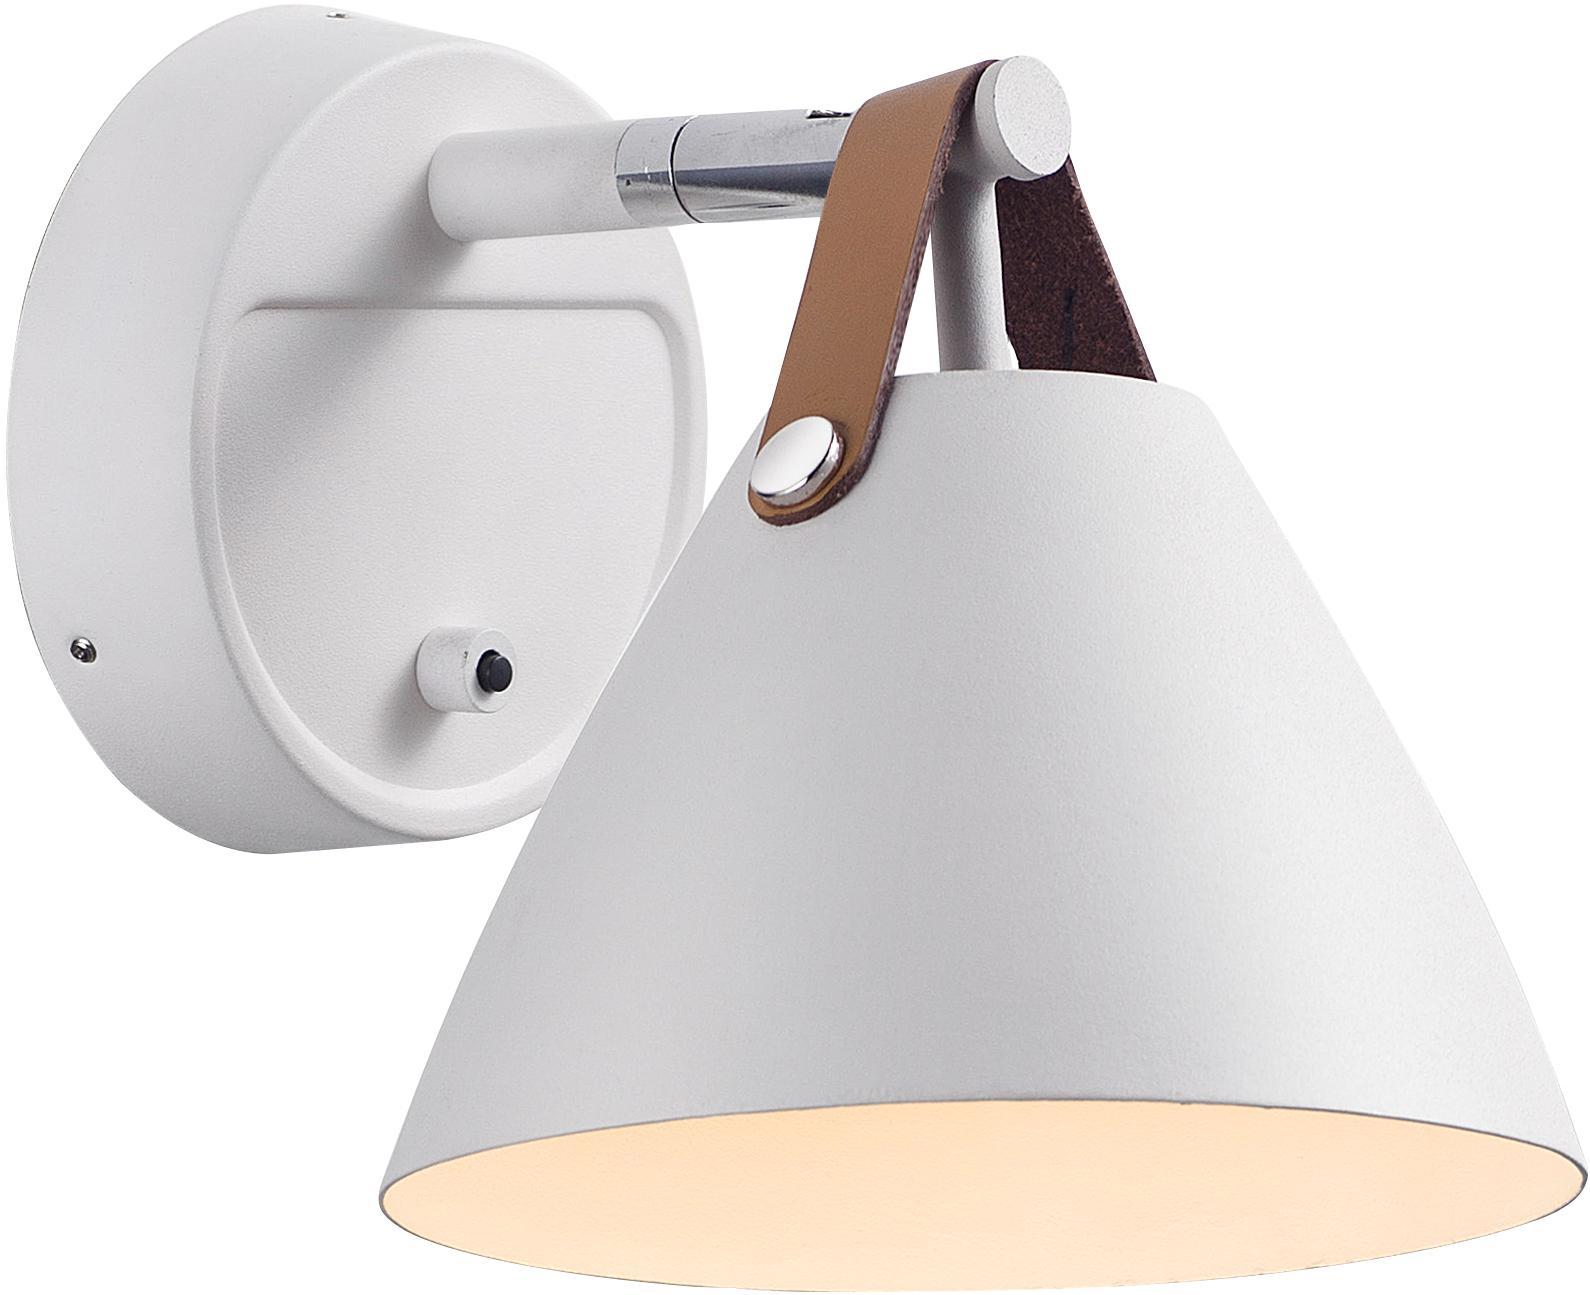 Wandlamp Strap met stekker, Lampenkap en wandbevestiging: wit. Leren band: zandkleurig of zwart, 17 x 17 cm